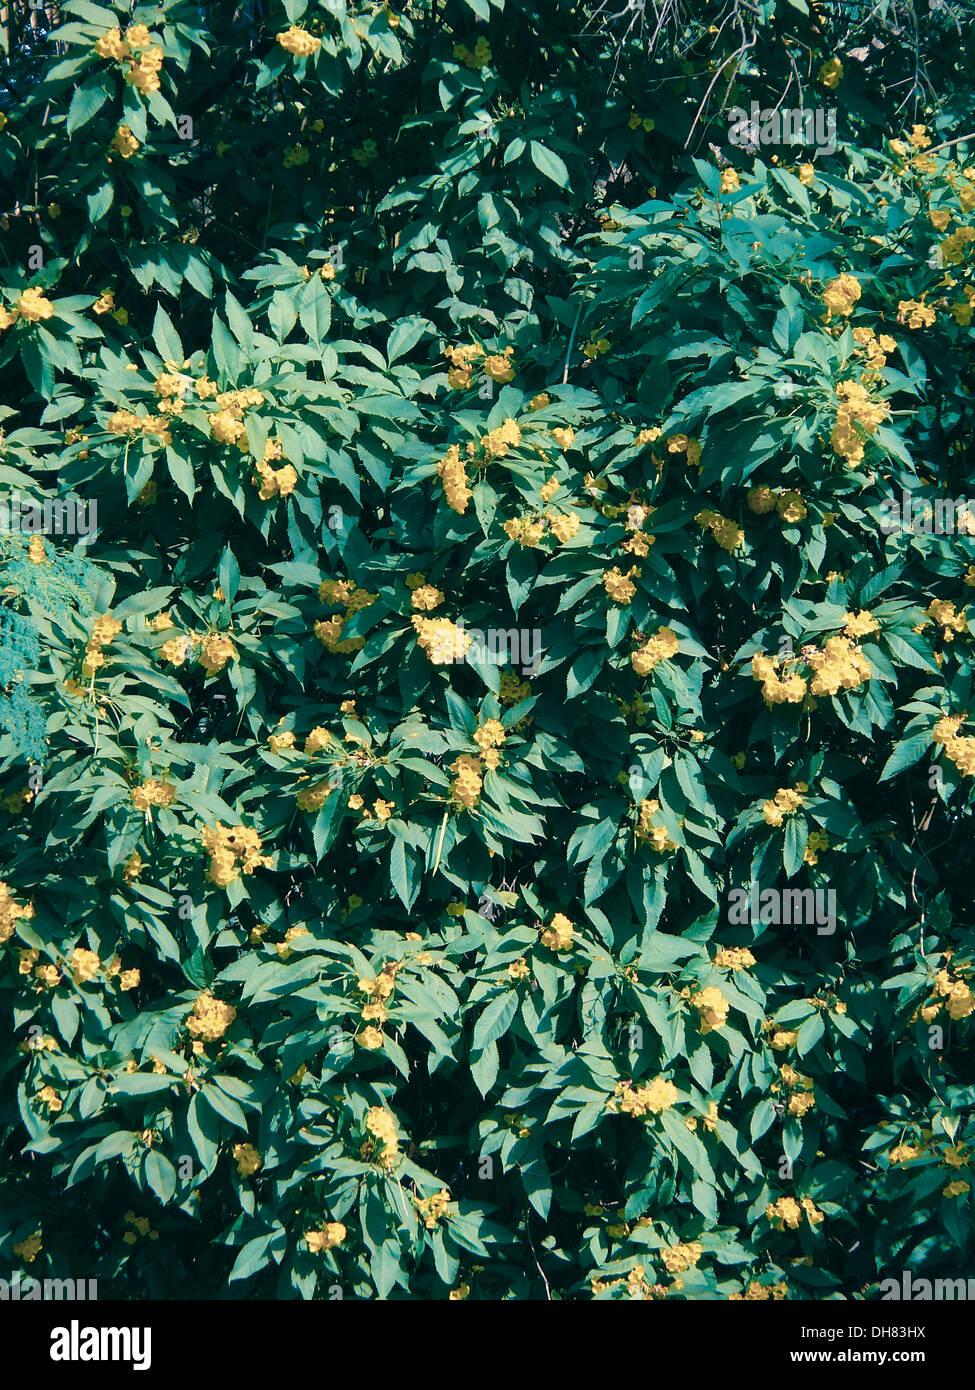 Tree of yellow bells yellow trumpet yellow elder tecoma stans tree of yellow bells yellow trumpet yellow elder tecoma stans mightylinksfo